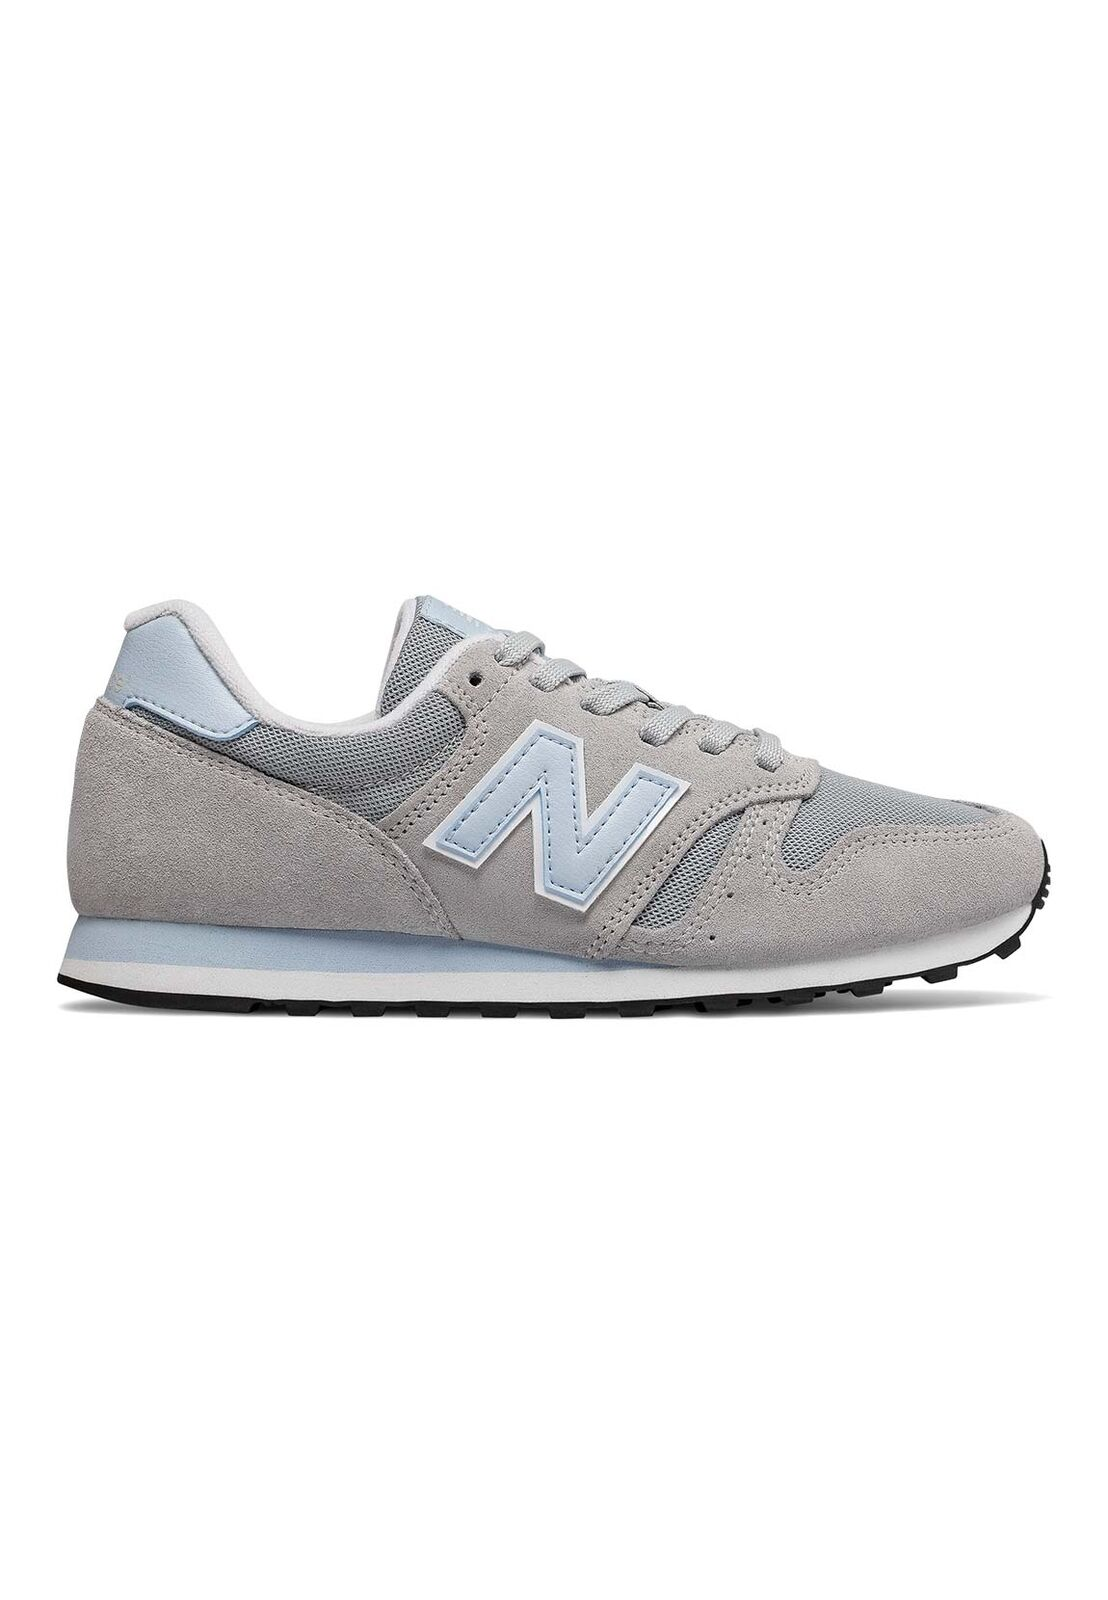 mejor servicio New New New Balance Zapatilla Deportiva Mujer WL373LAA gris  minorista de fitness